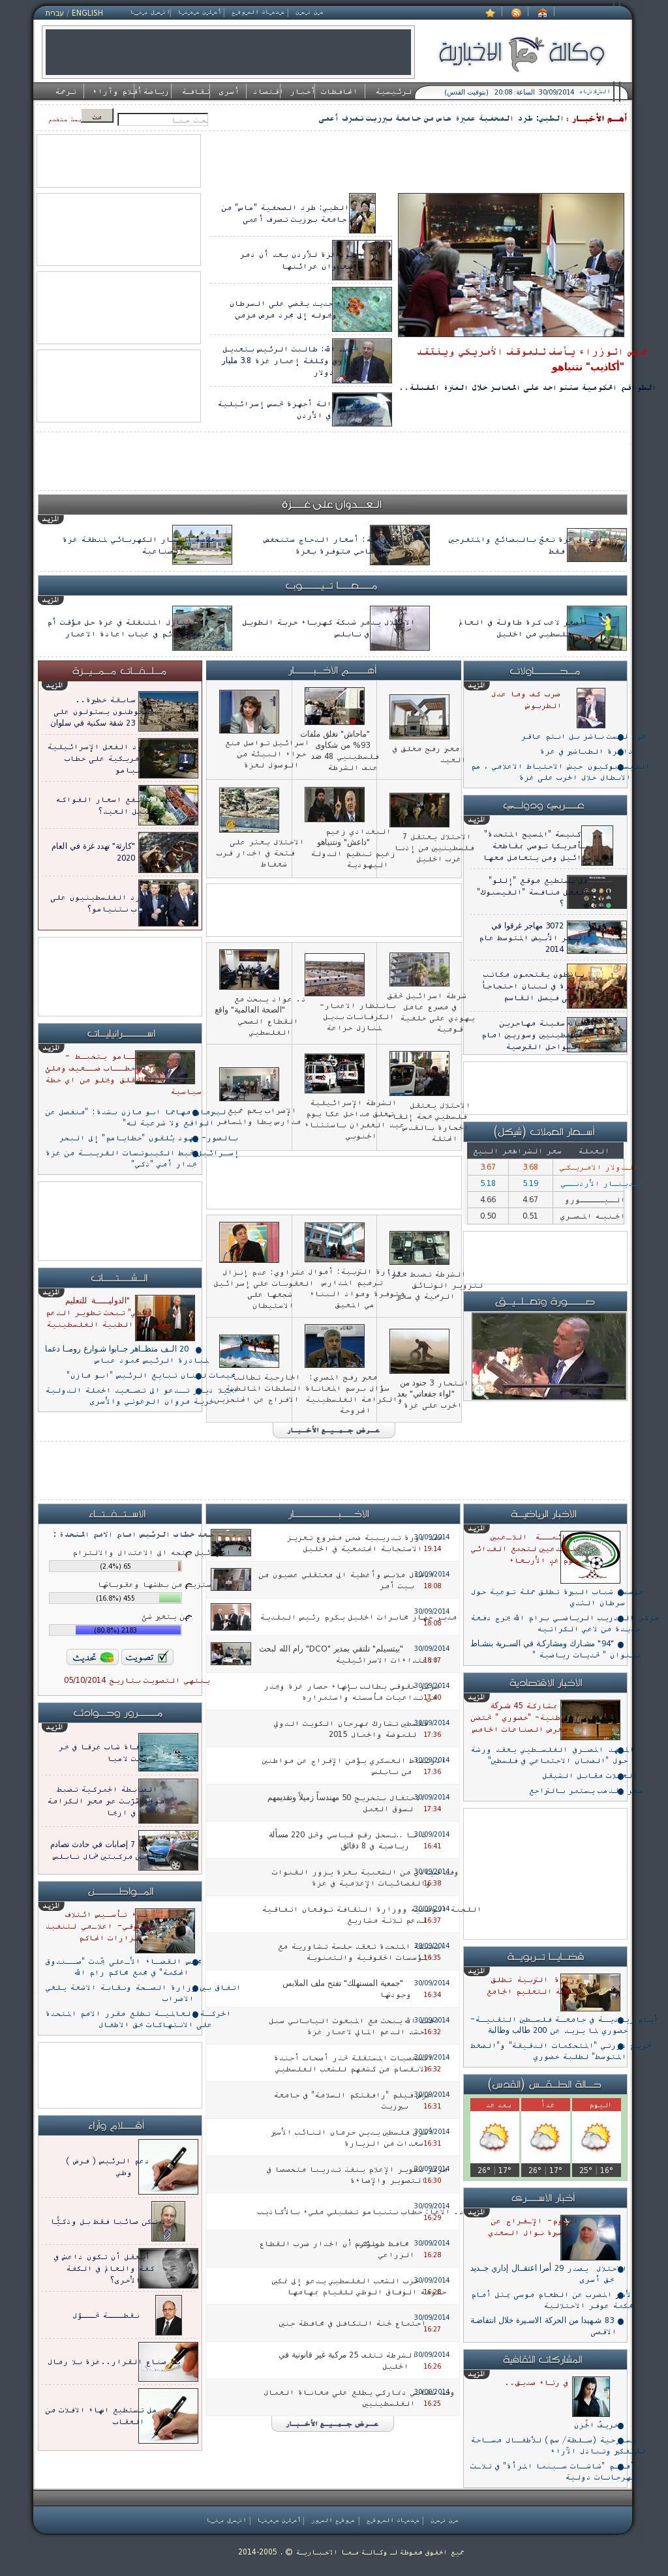 Ma'an News at Tuesday Sept. 30, 2014, 5:08 p.m. UTC